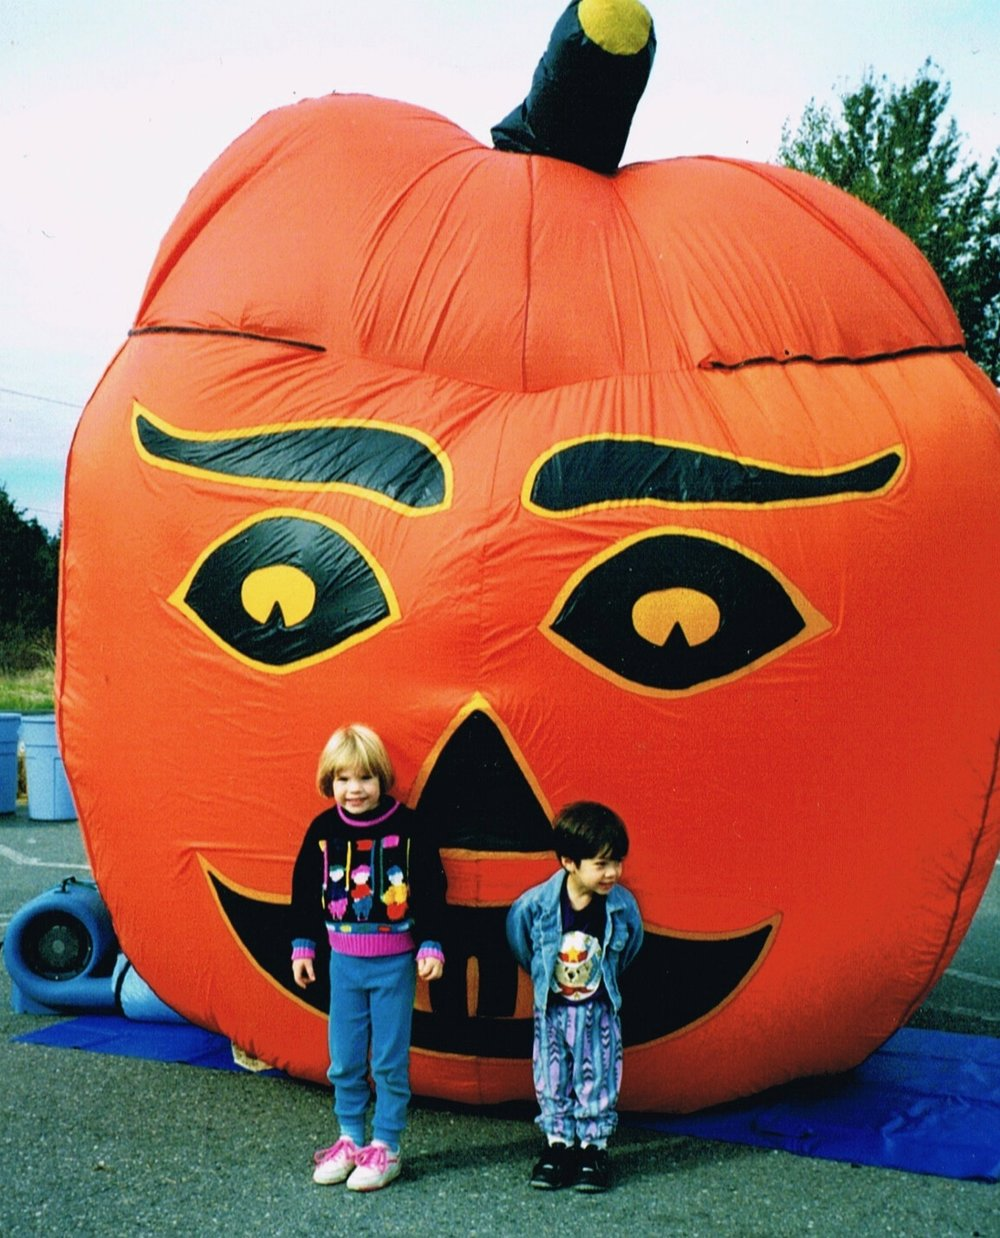 Jack O' Lantern Halloween Pumpkin